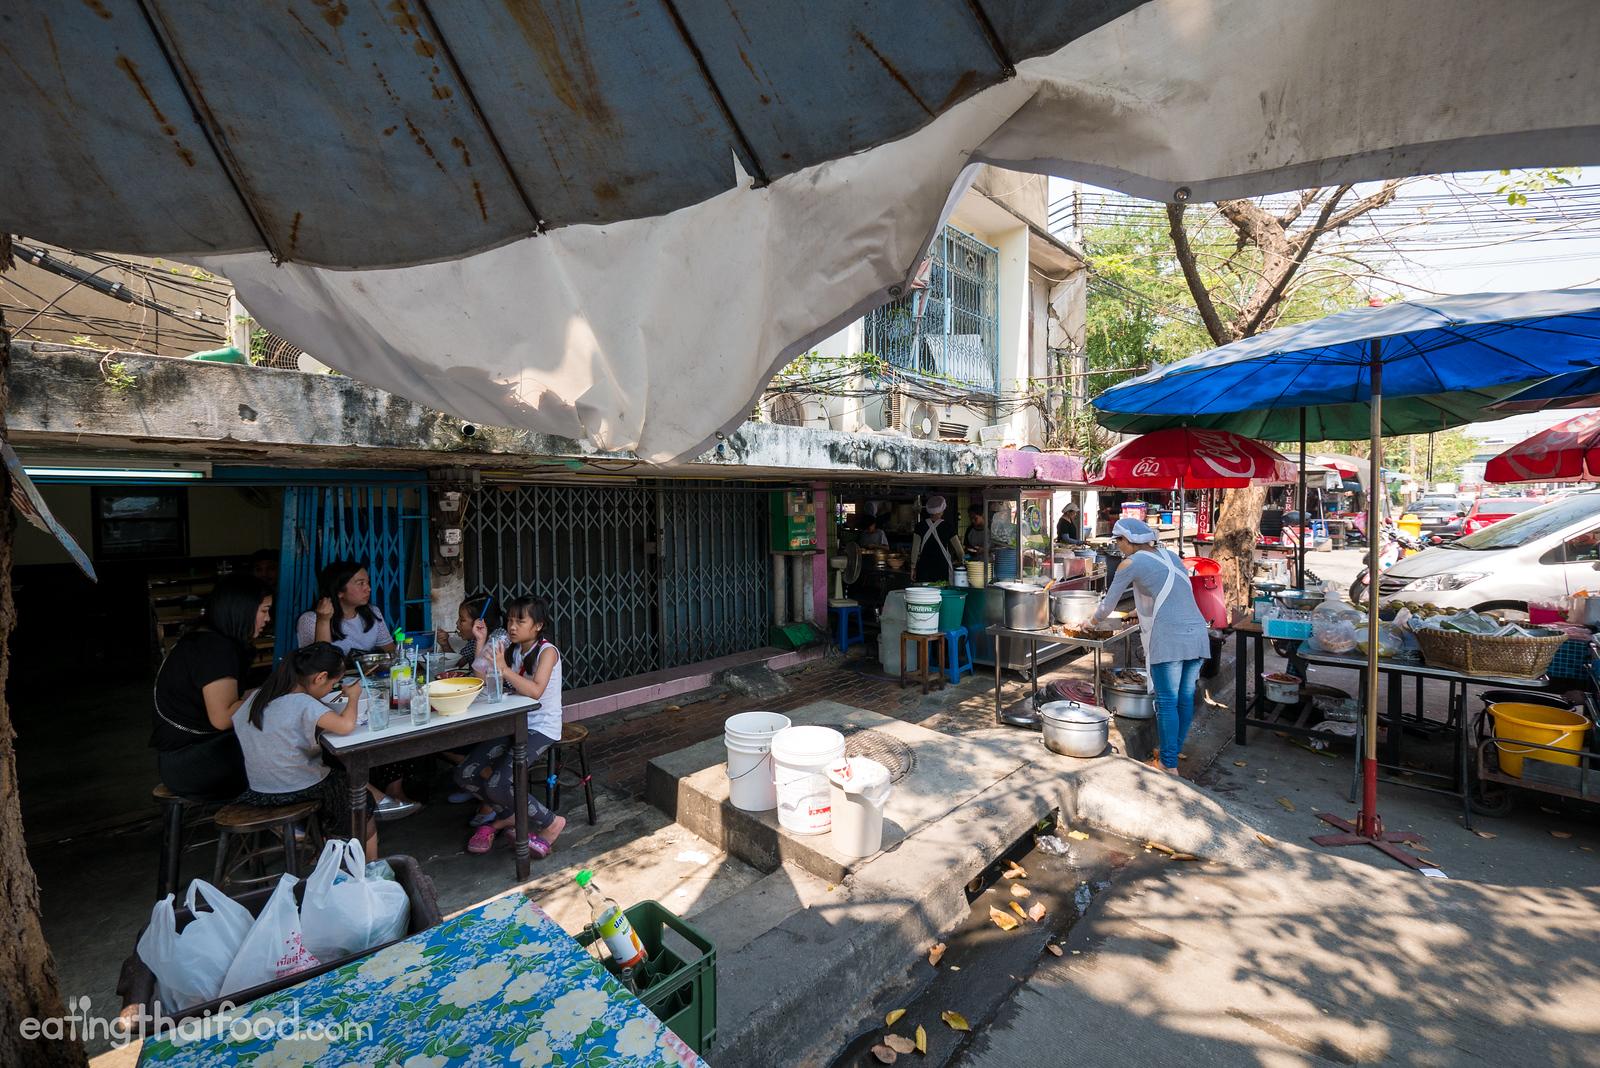 Neua Toon Tha Nam Sathu Pradit (ร้านเนื้อตุ๋นท่าน้ำสาธุประดิษฐ์)